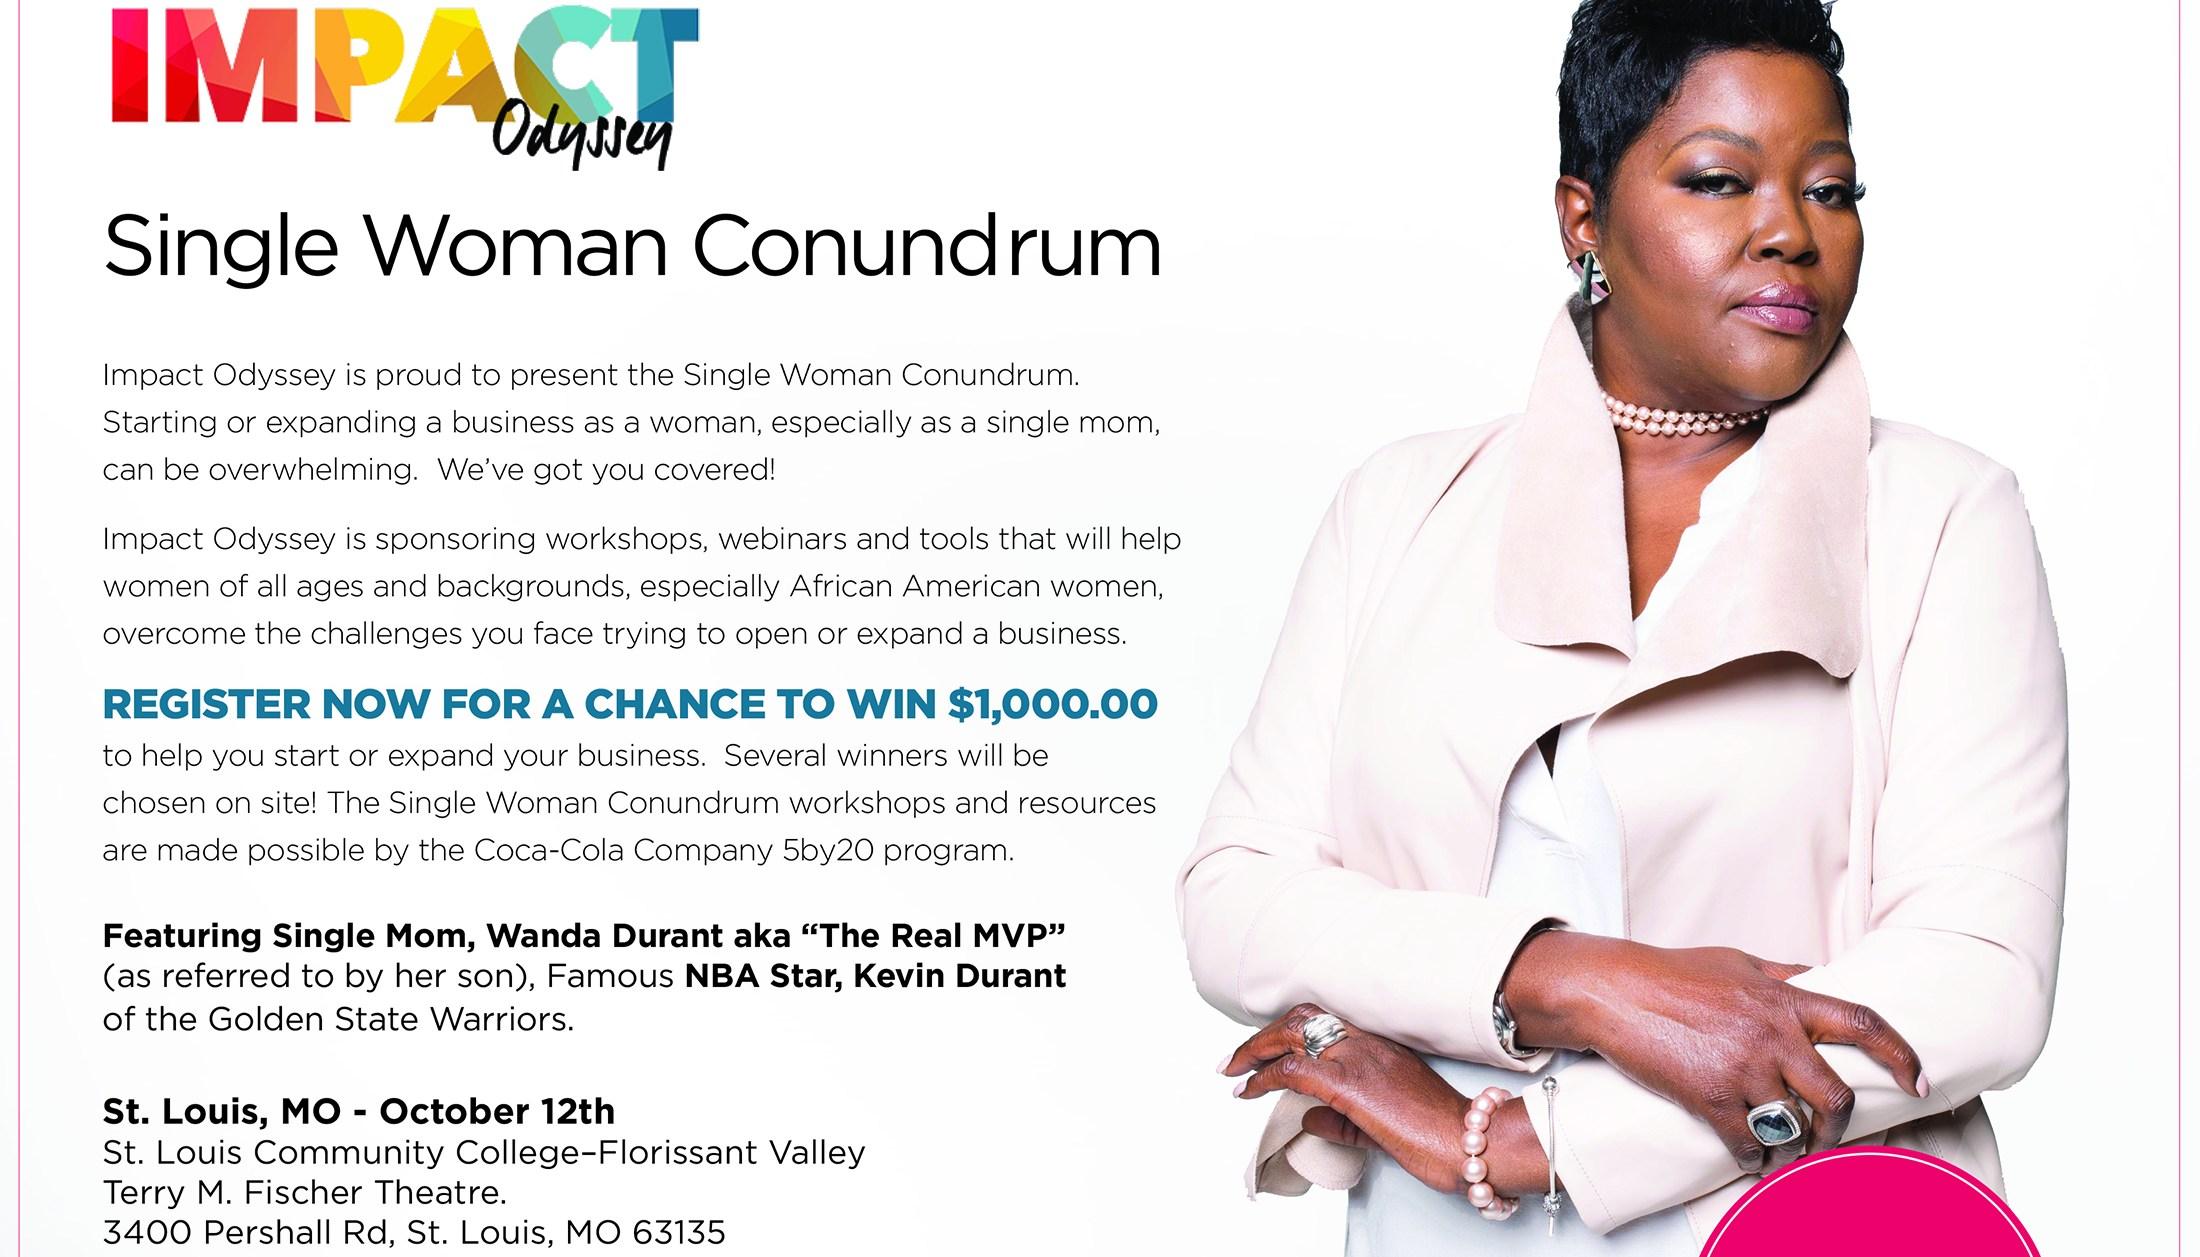 Single Woman Conundrum